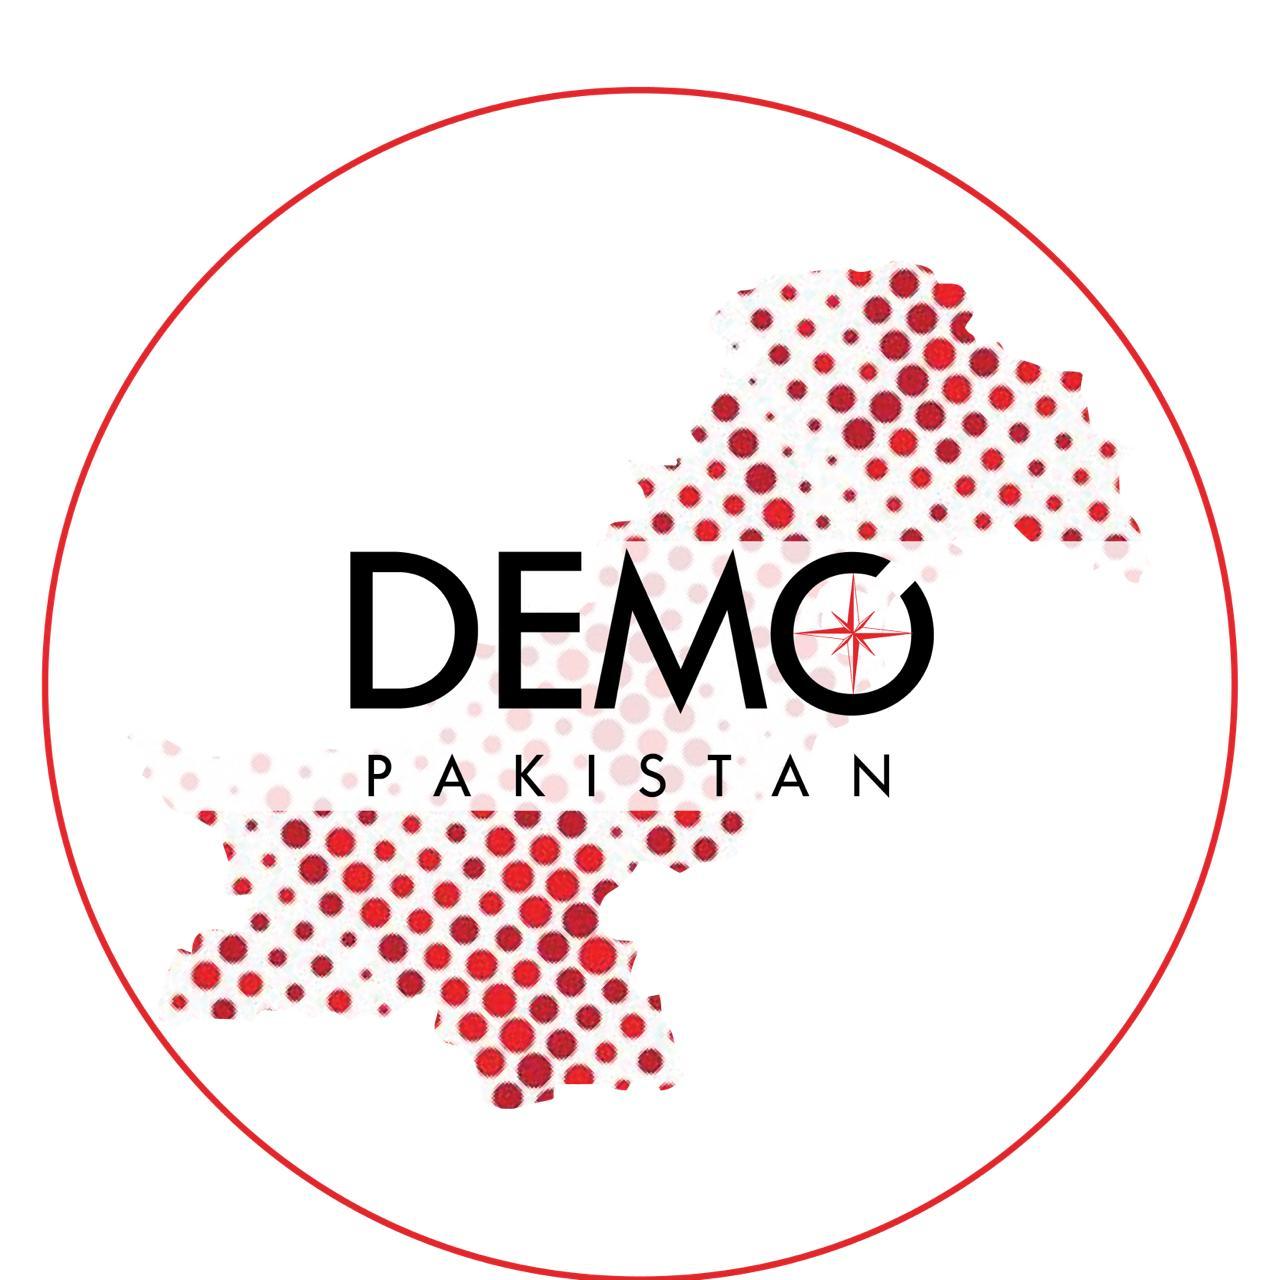 Demo Pakistan